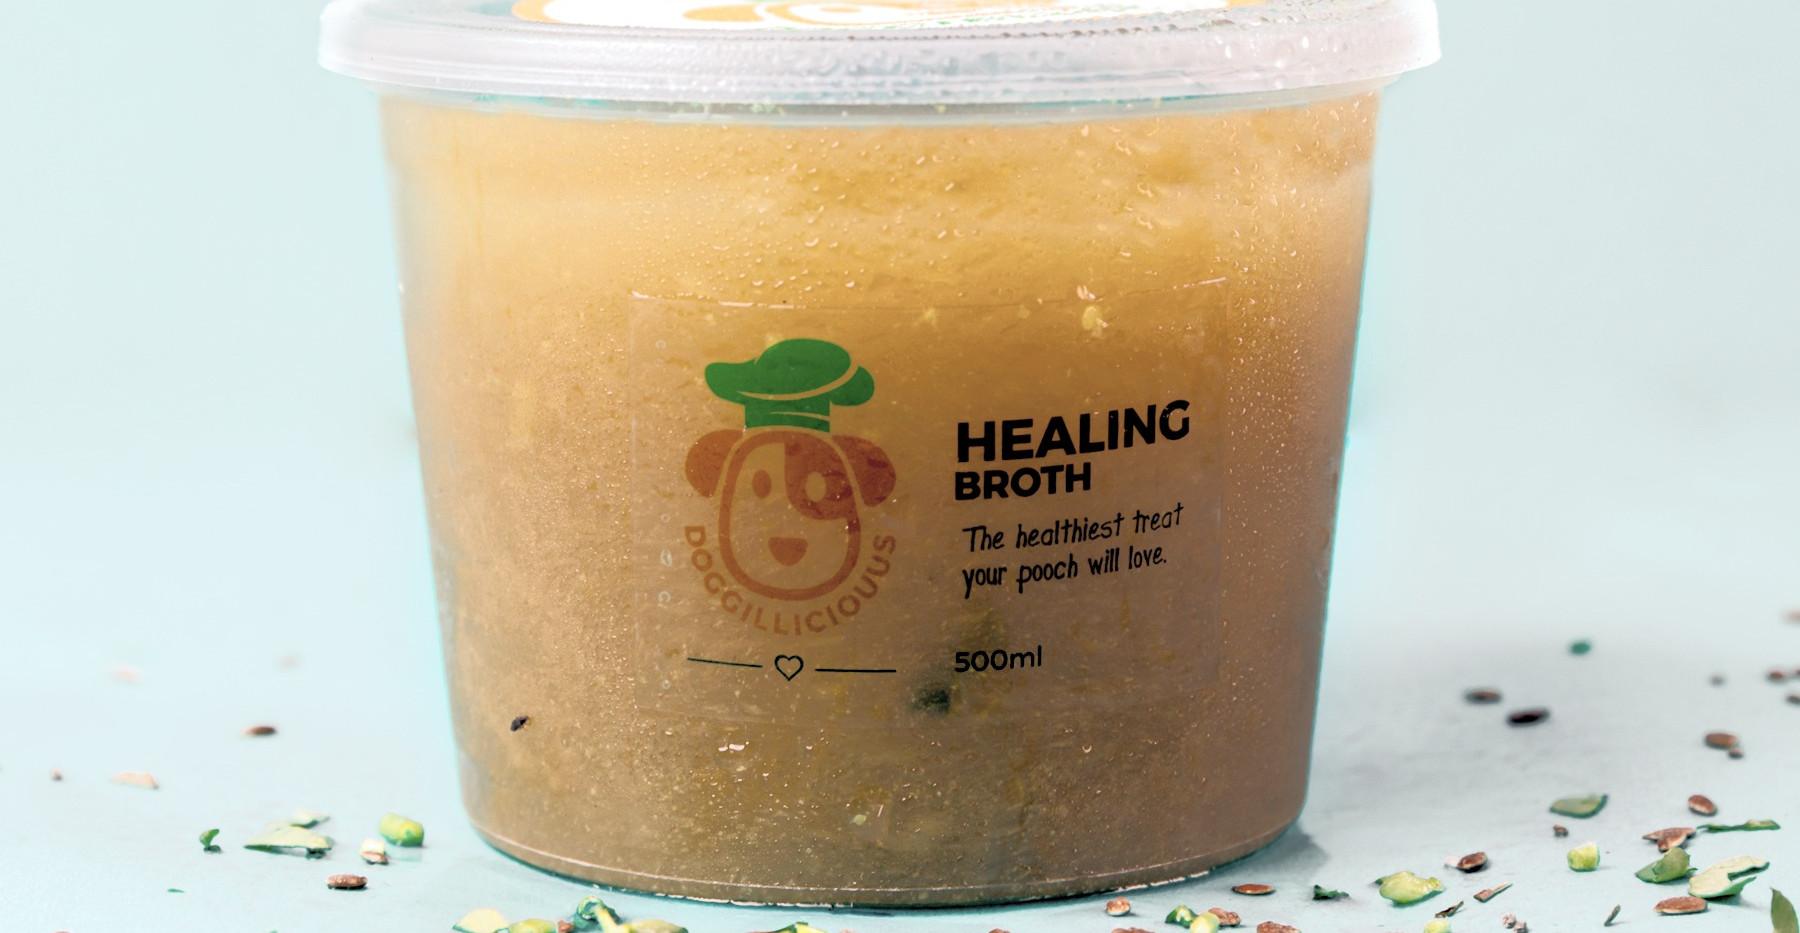 Doggiliciouus Healing broth